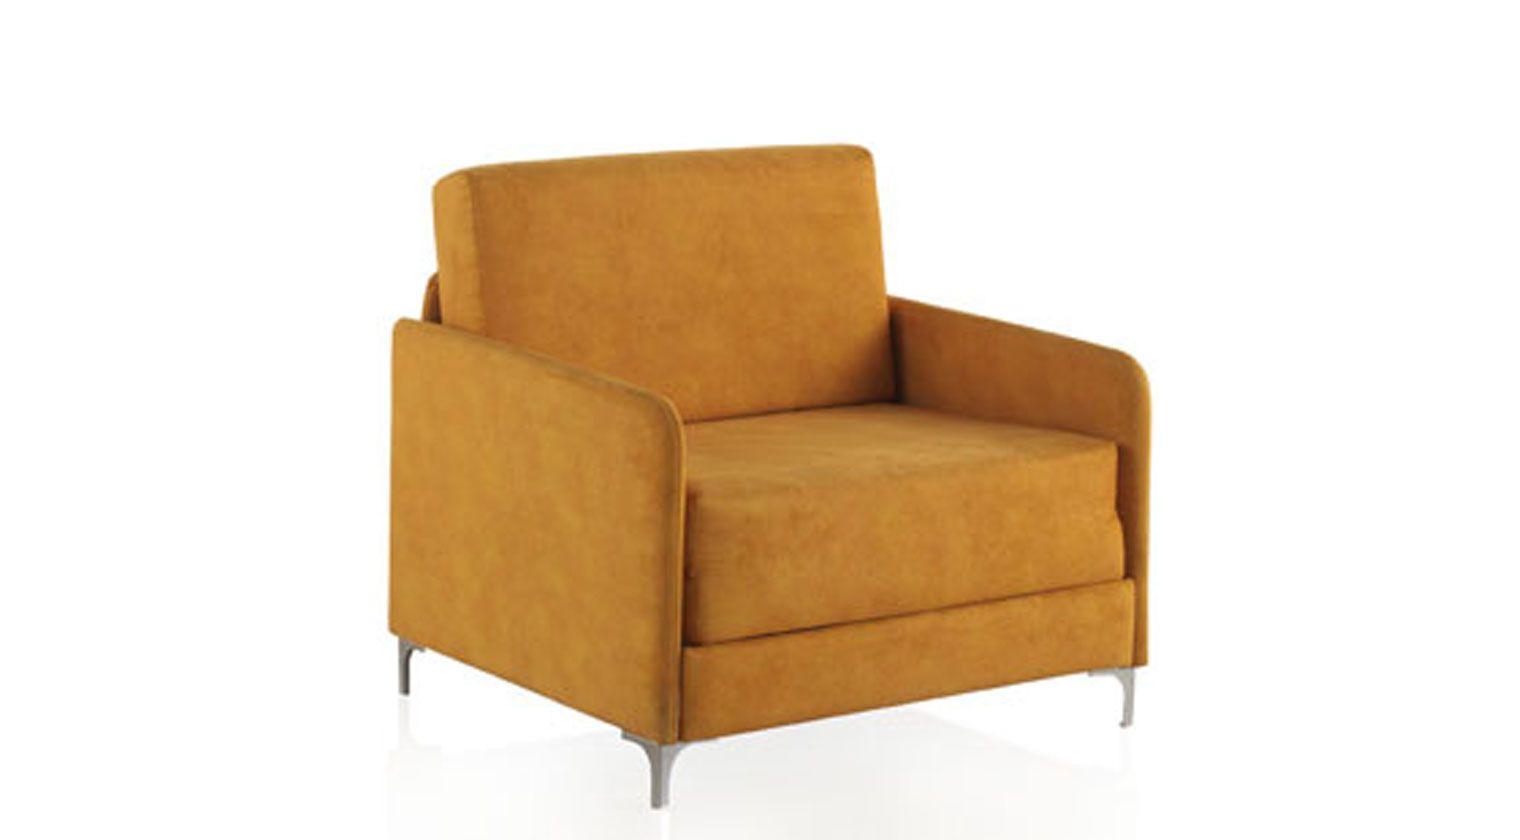 Sof cama nancy sofas cama extensible nido for Sofa cama extensible